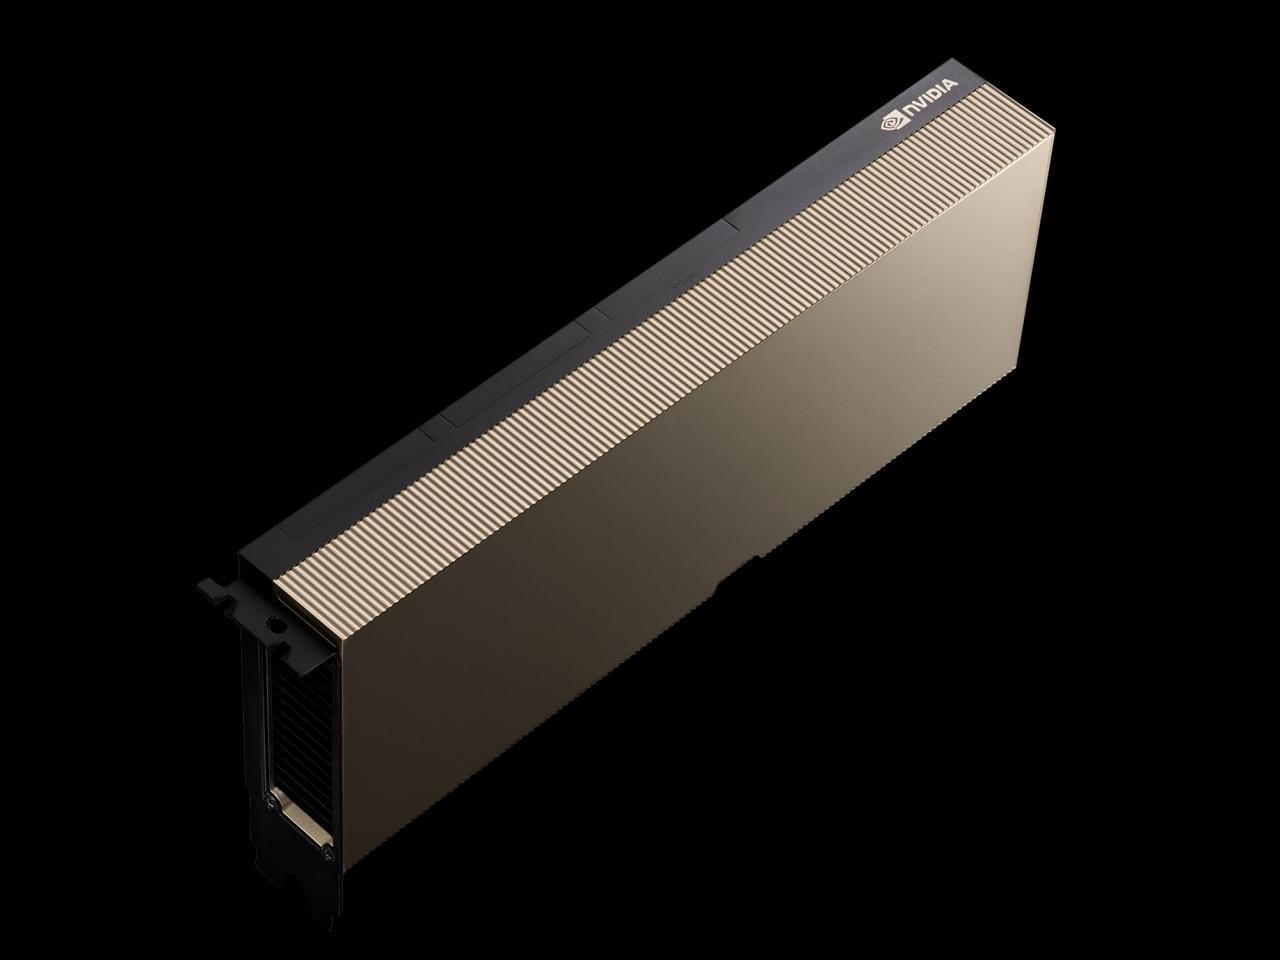 nvidia-readies-ampere-a100-pcie-gpu-with-80-gb-hbm2e-memory-&-up-to-2-tb/s-bandwidth